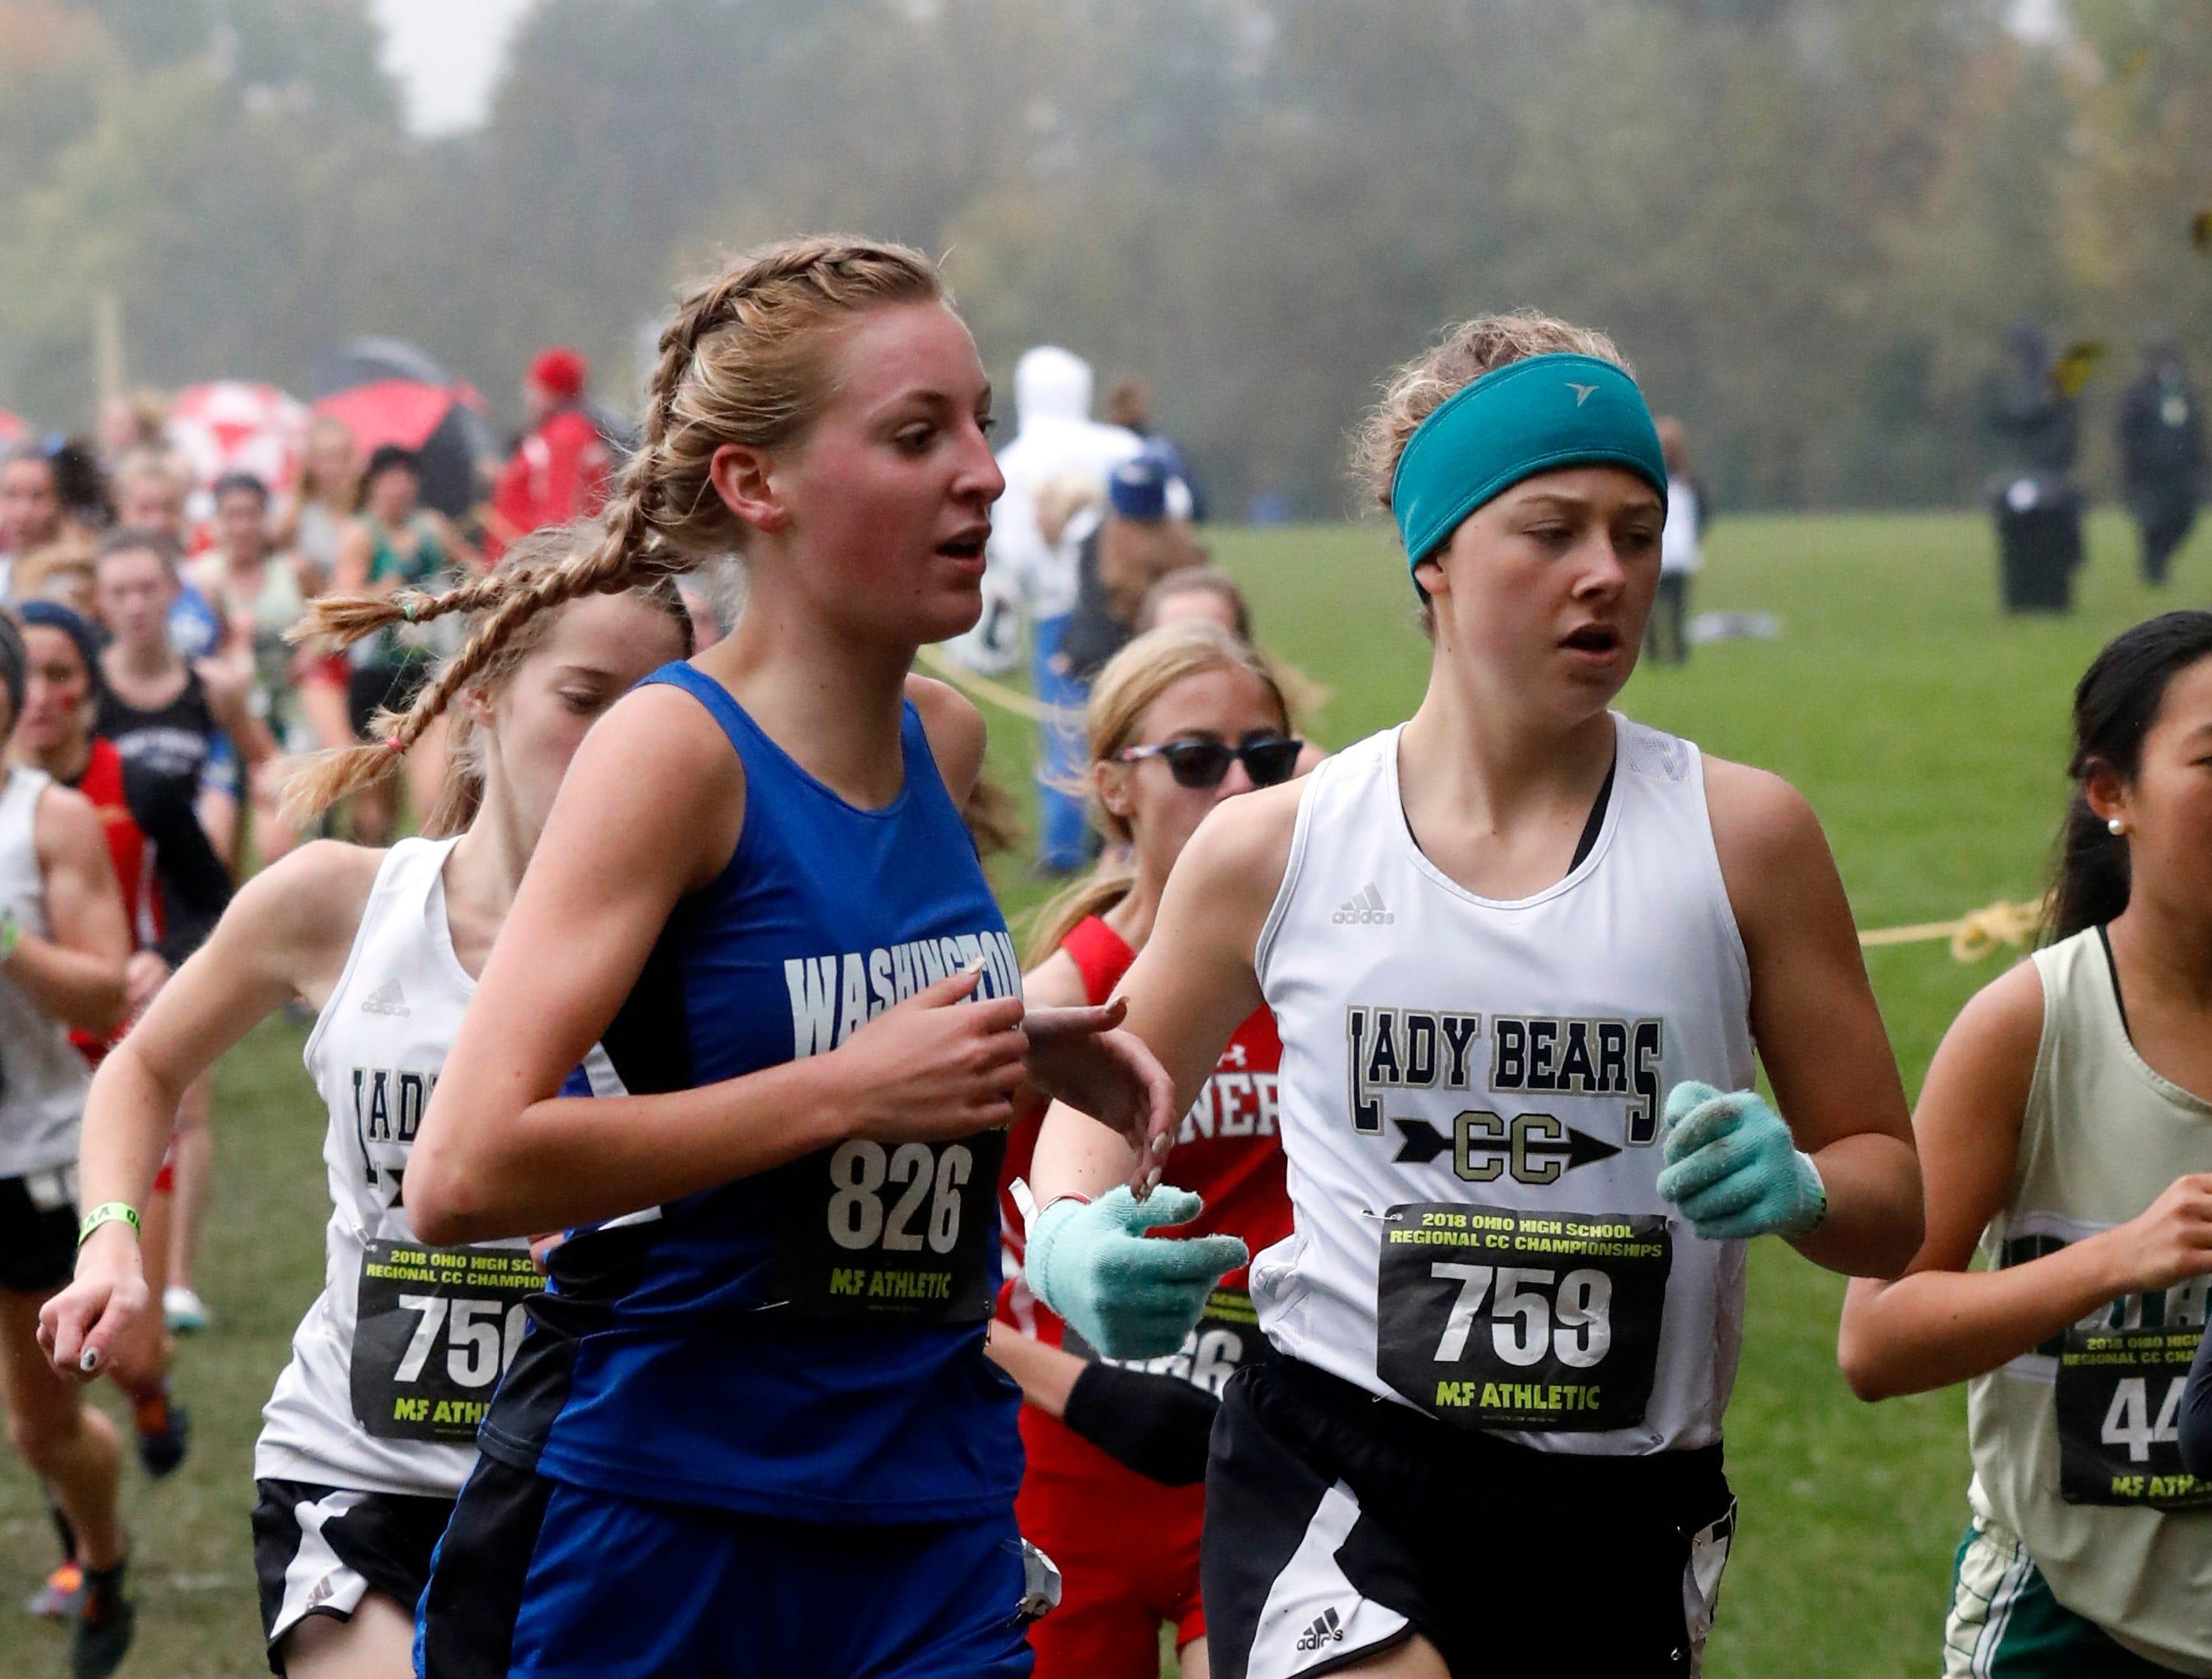 River View's Aliya Stevens runs in the Regional Cross Country meet Saturday, Oct. 27, 2018, at Pickerington North High School in Pickerington.